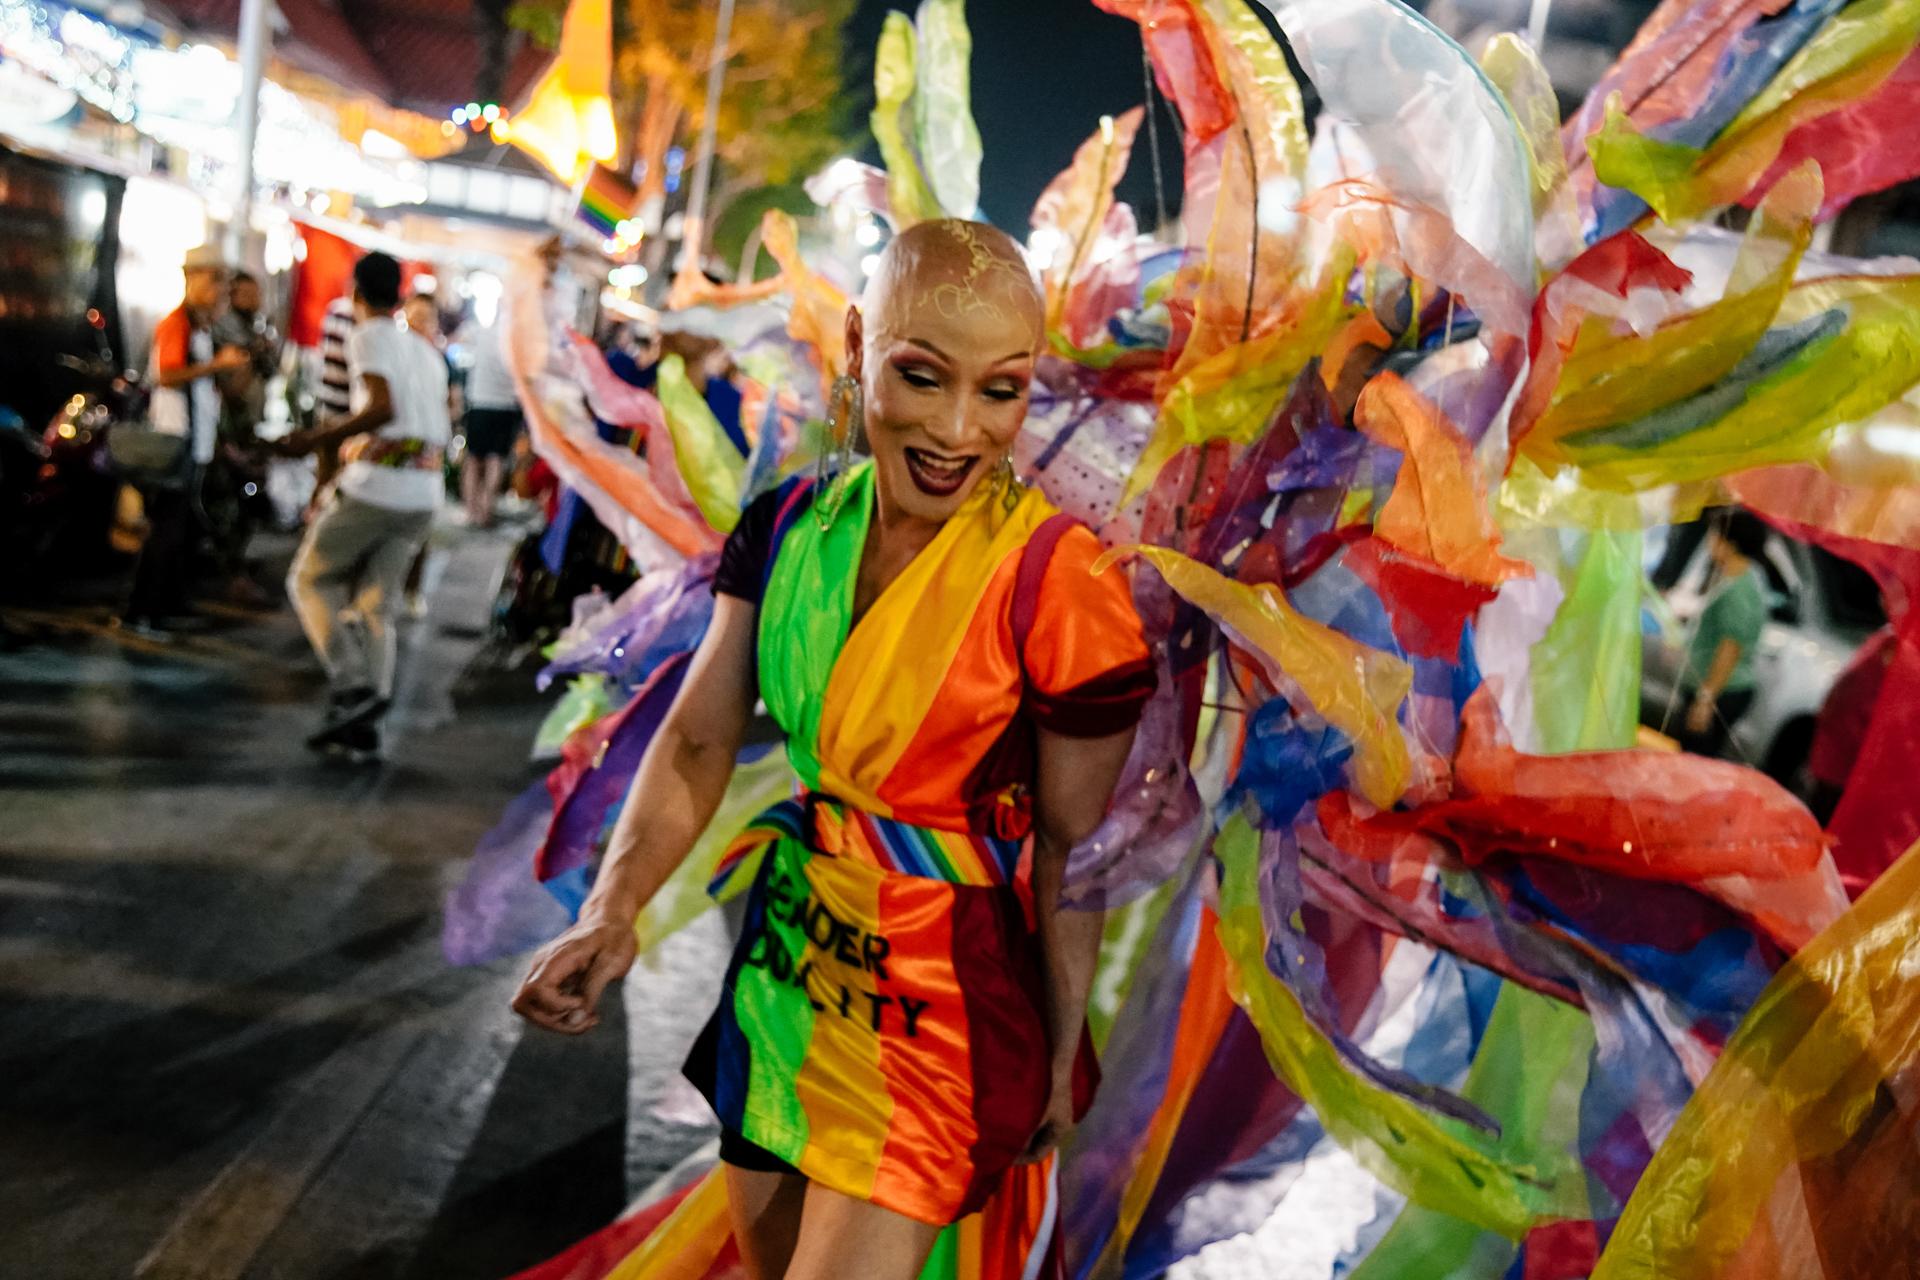 Chiang Mai Pride 2019, Thailand (2019)